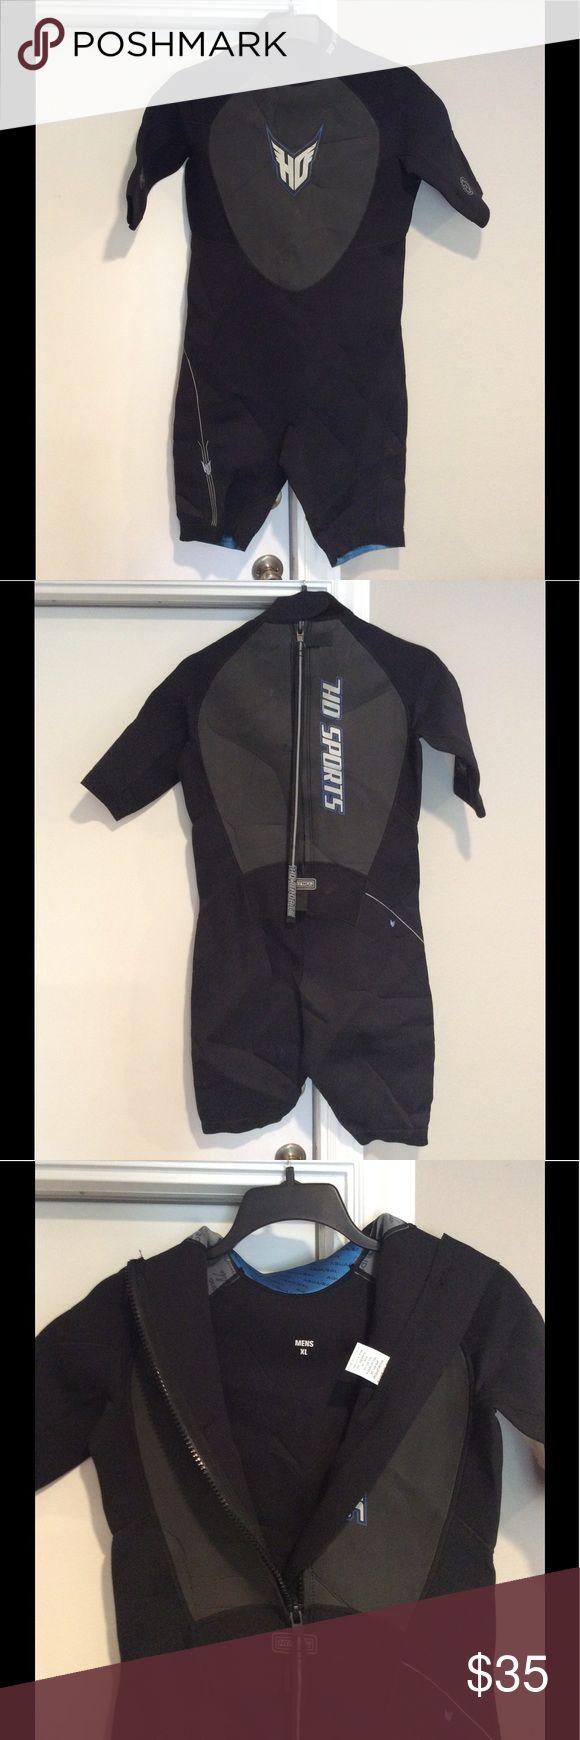 "HO ""Blaze"" 2mm Shorty Spring Wetsuit Men's XL HO SPORTS FreedomFlex Men XL Black 2mm Wet Suit Blaze Shorty Glideslide Aquaseal. Quality Wet Suit!  Like New condition ...Size Men XLarge.. HO Sports Swim"